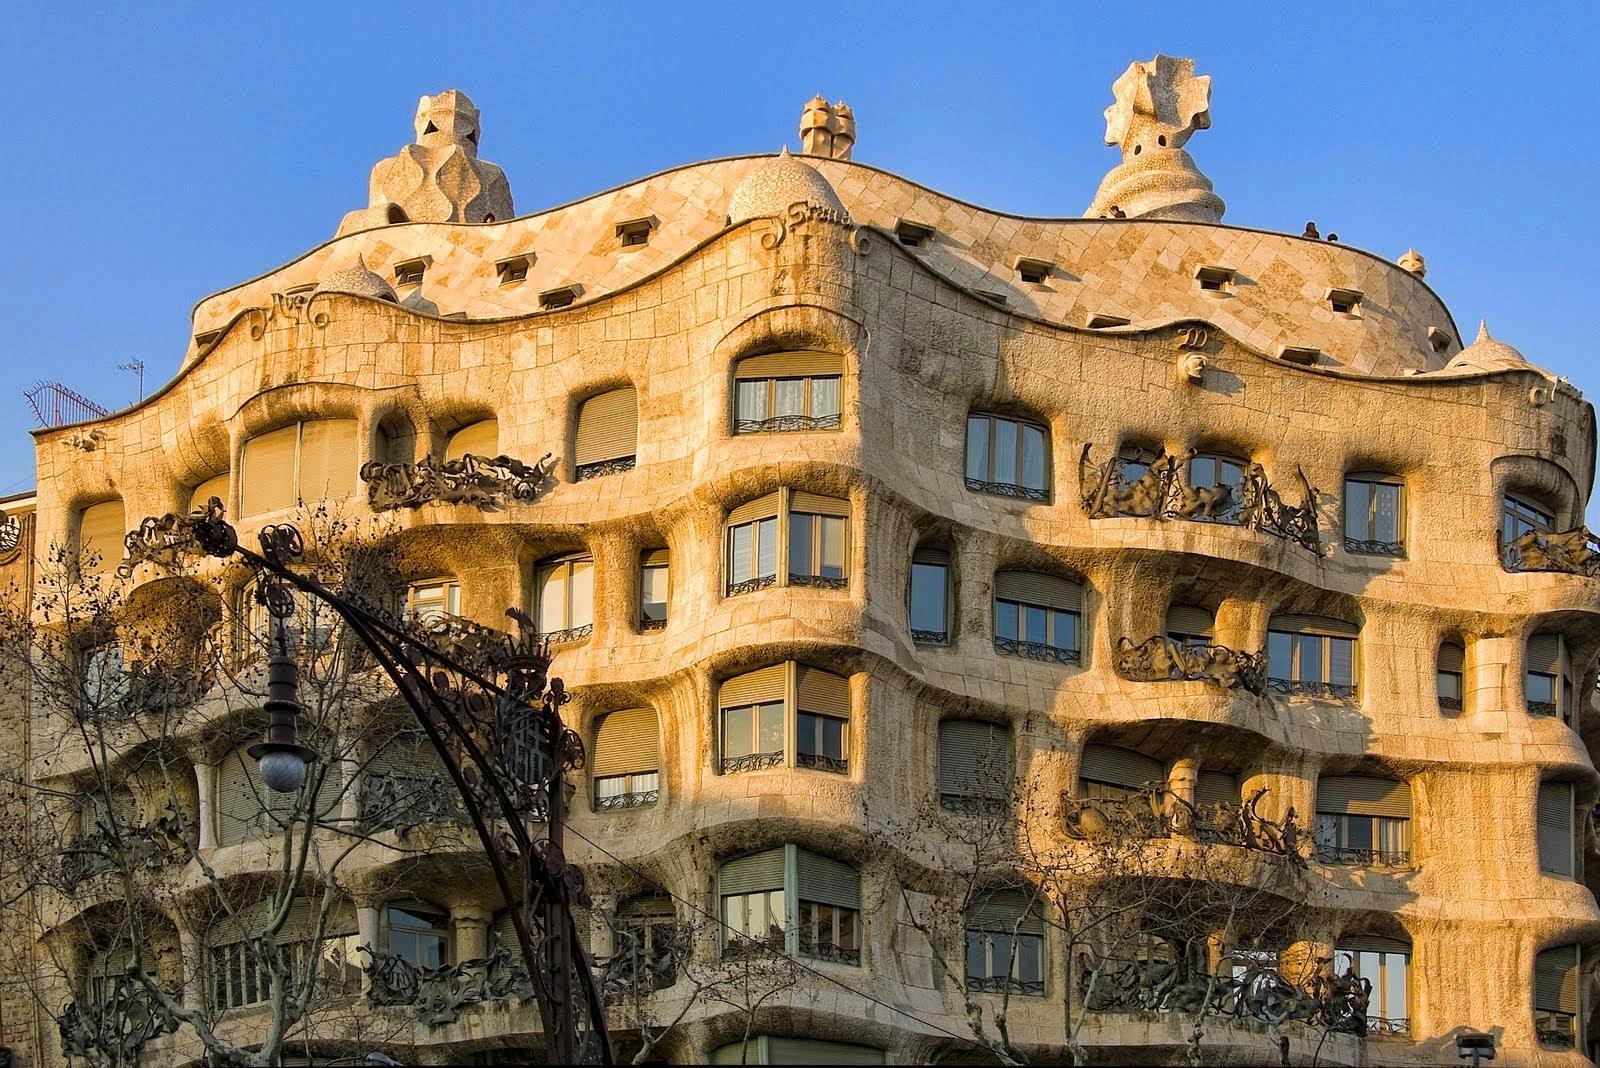 La pedrera em barcelona casa mil dicas de barcelona e - La casa de las lamparas barcelona ...